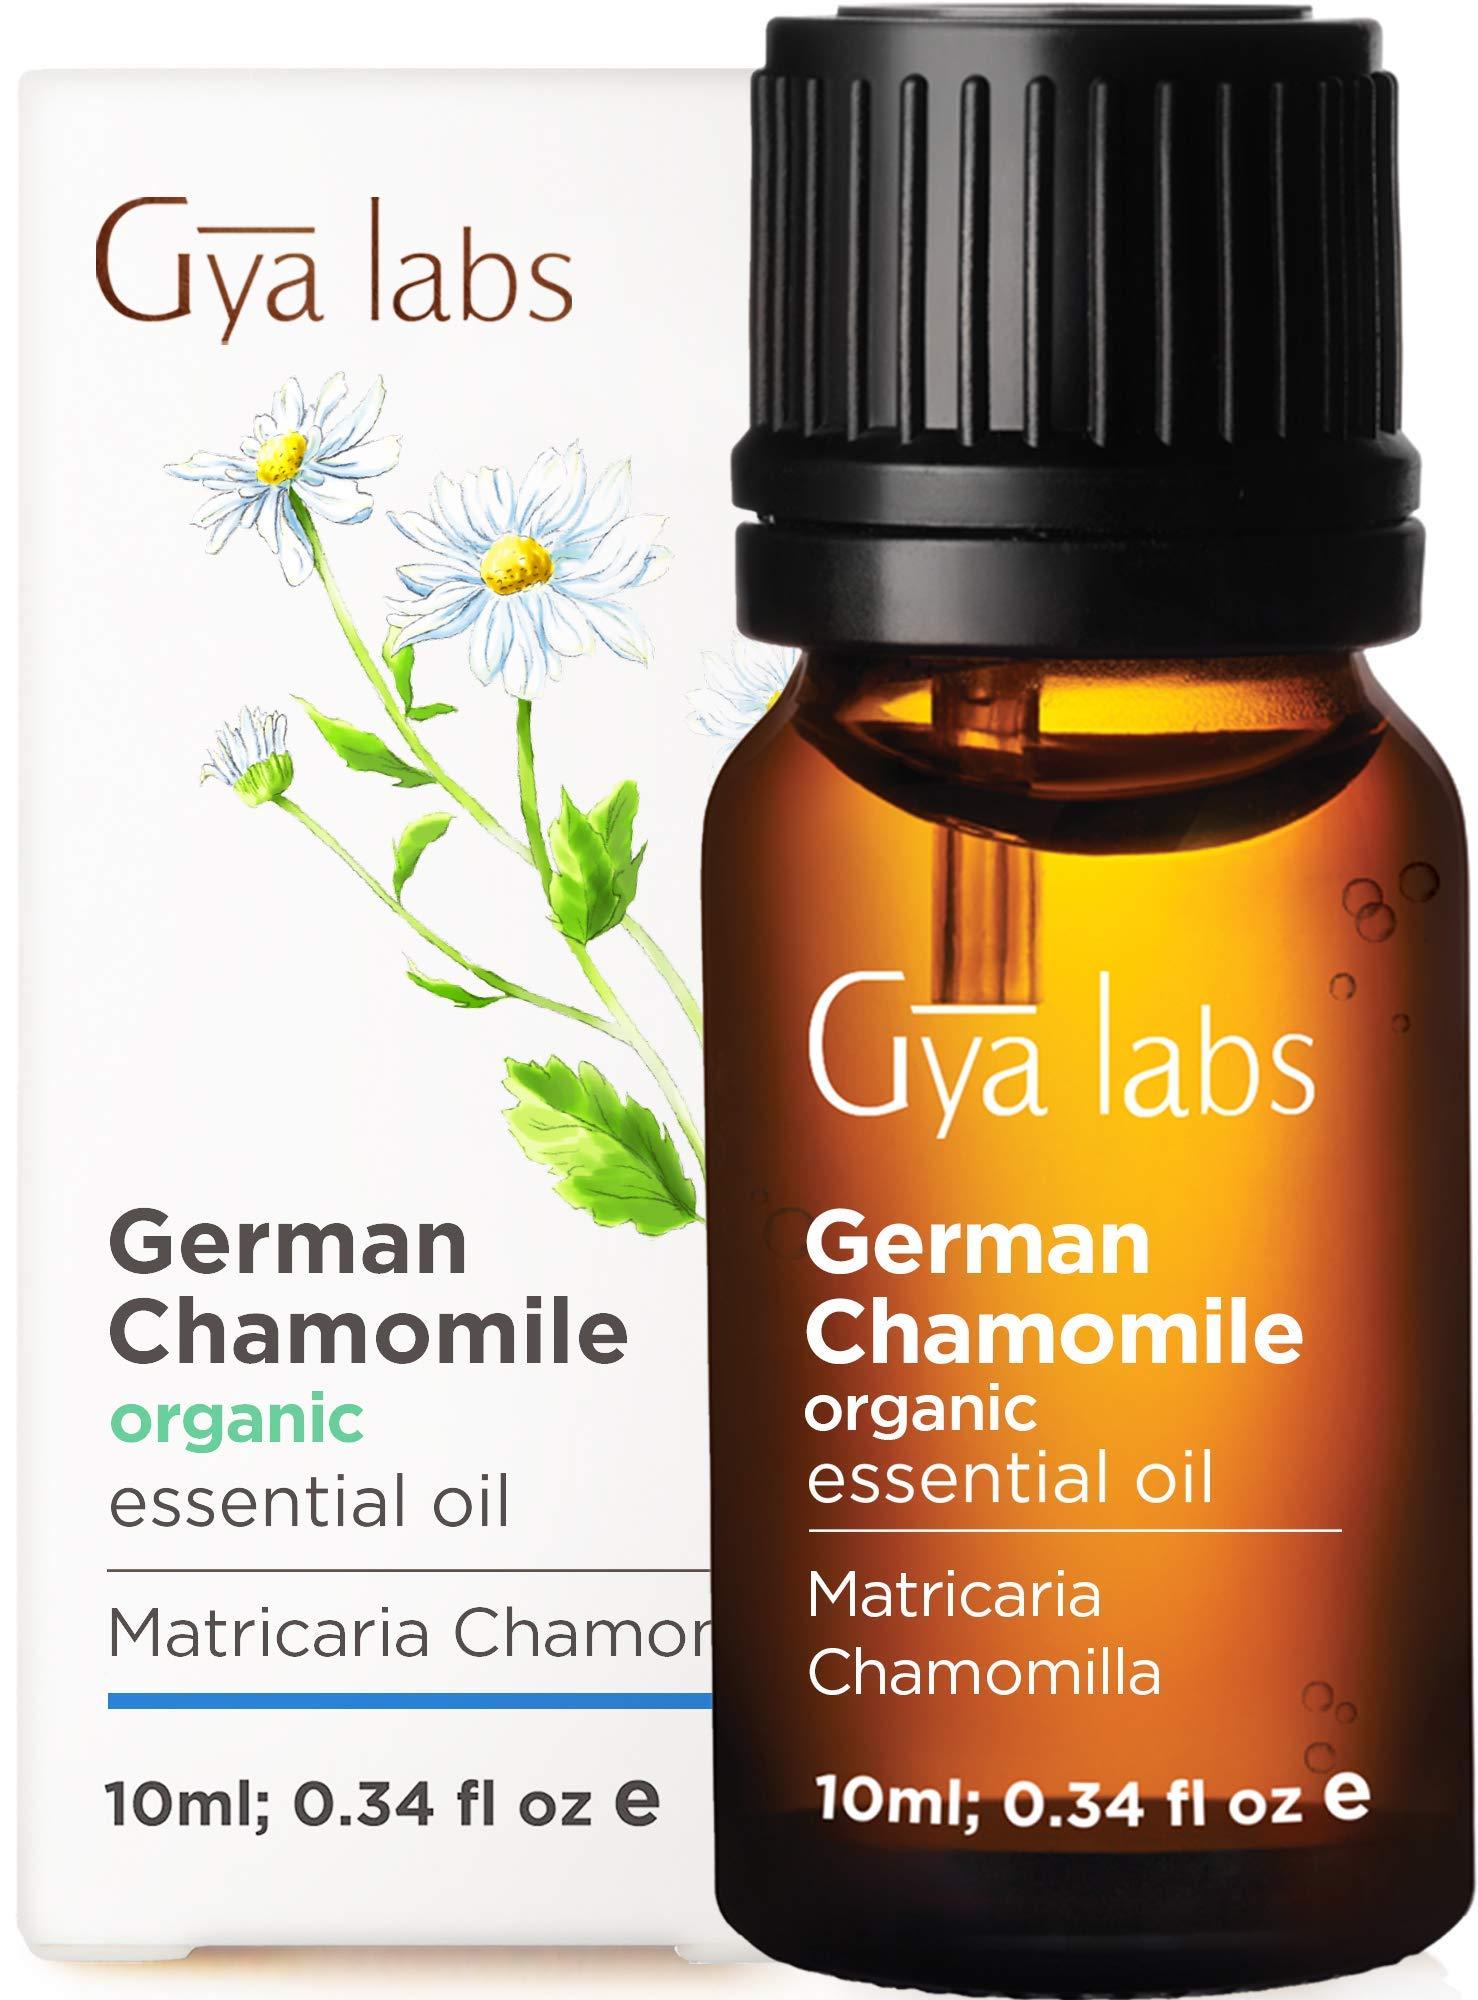 Gya Labs Organic German Chamomile Essential Oil